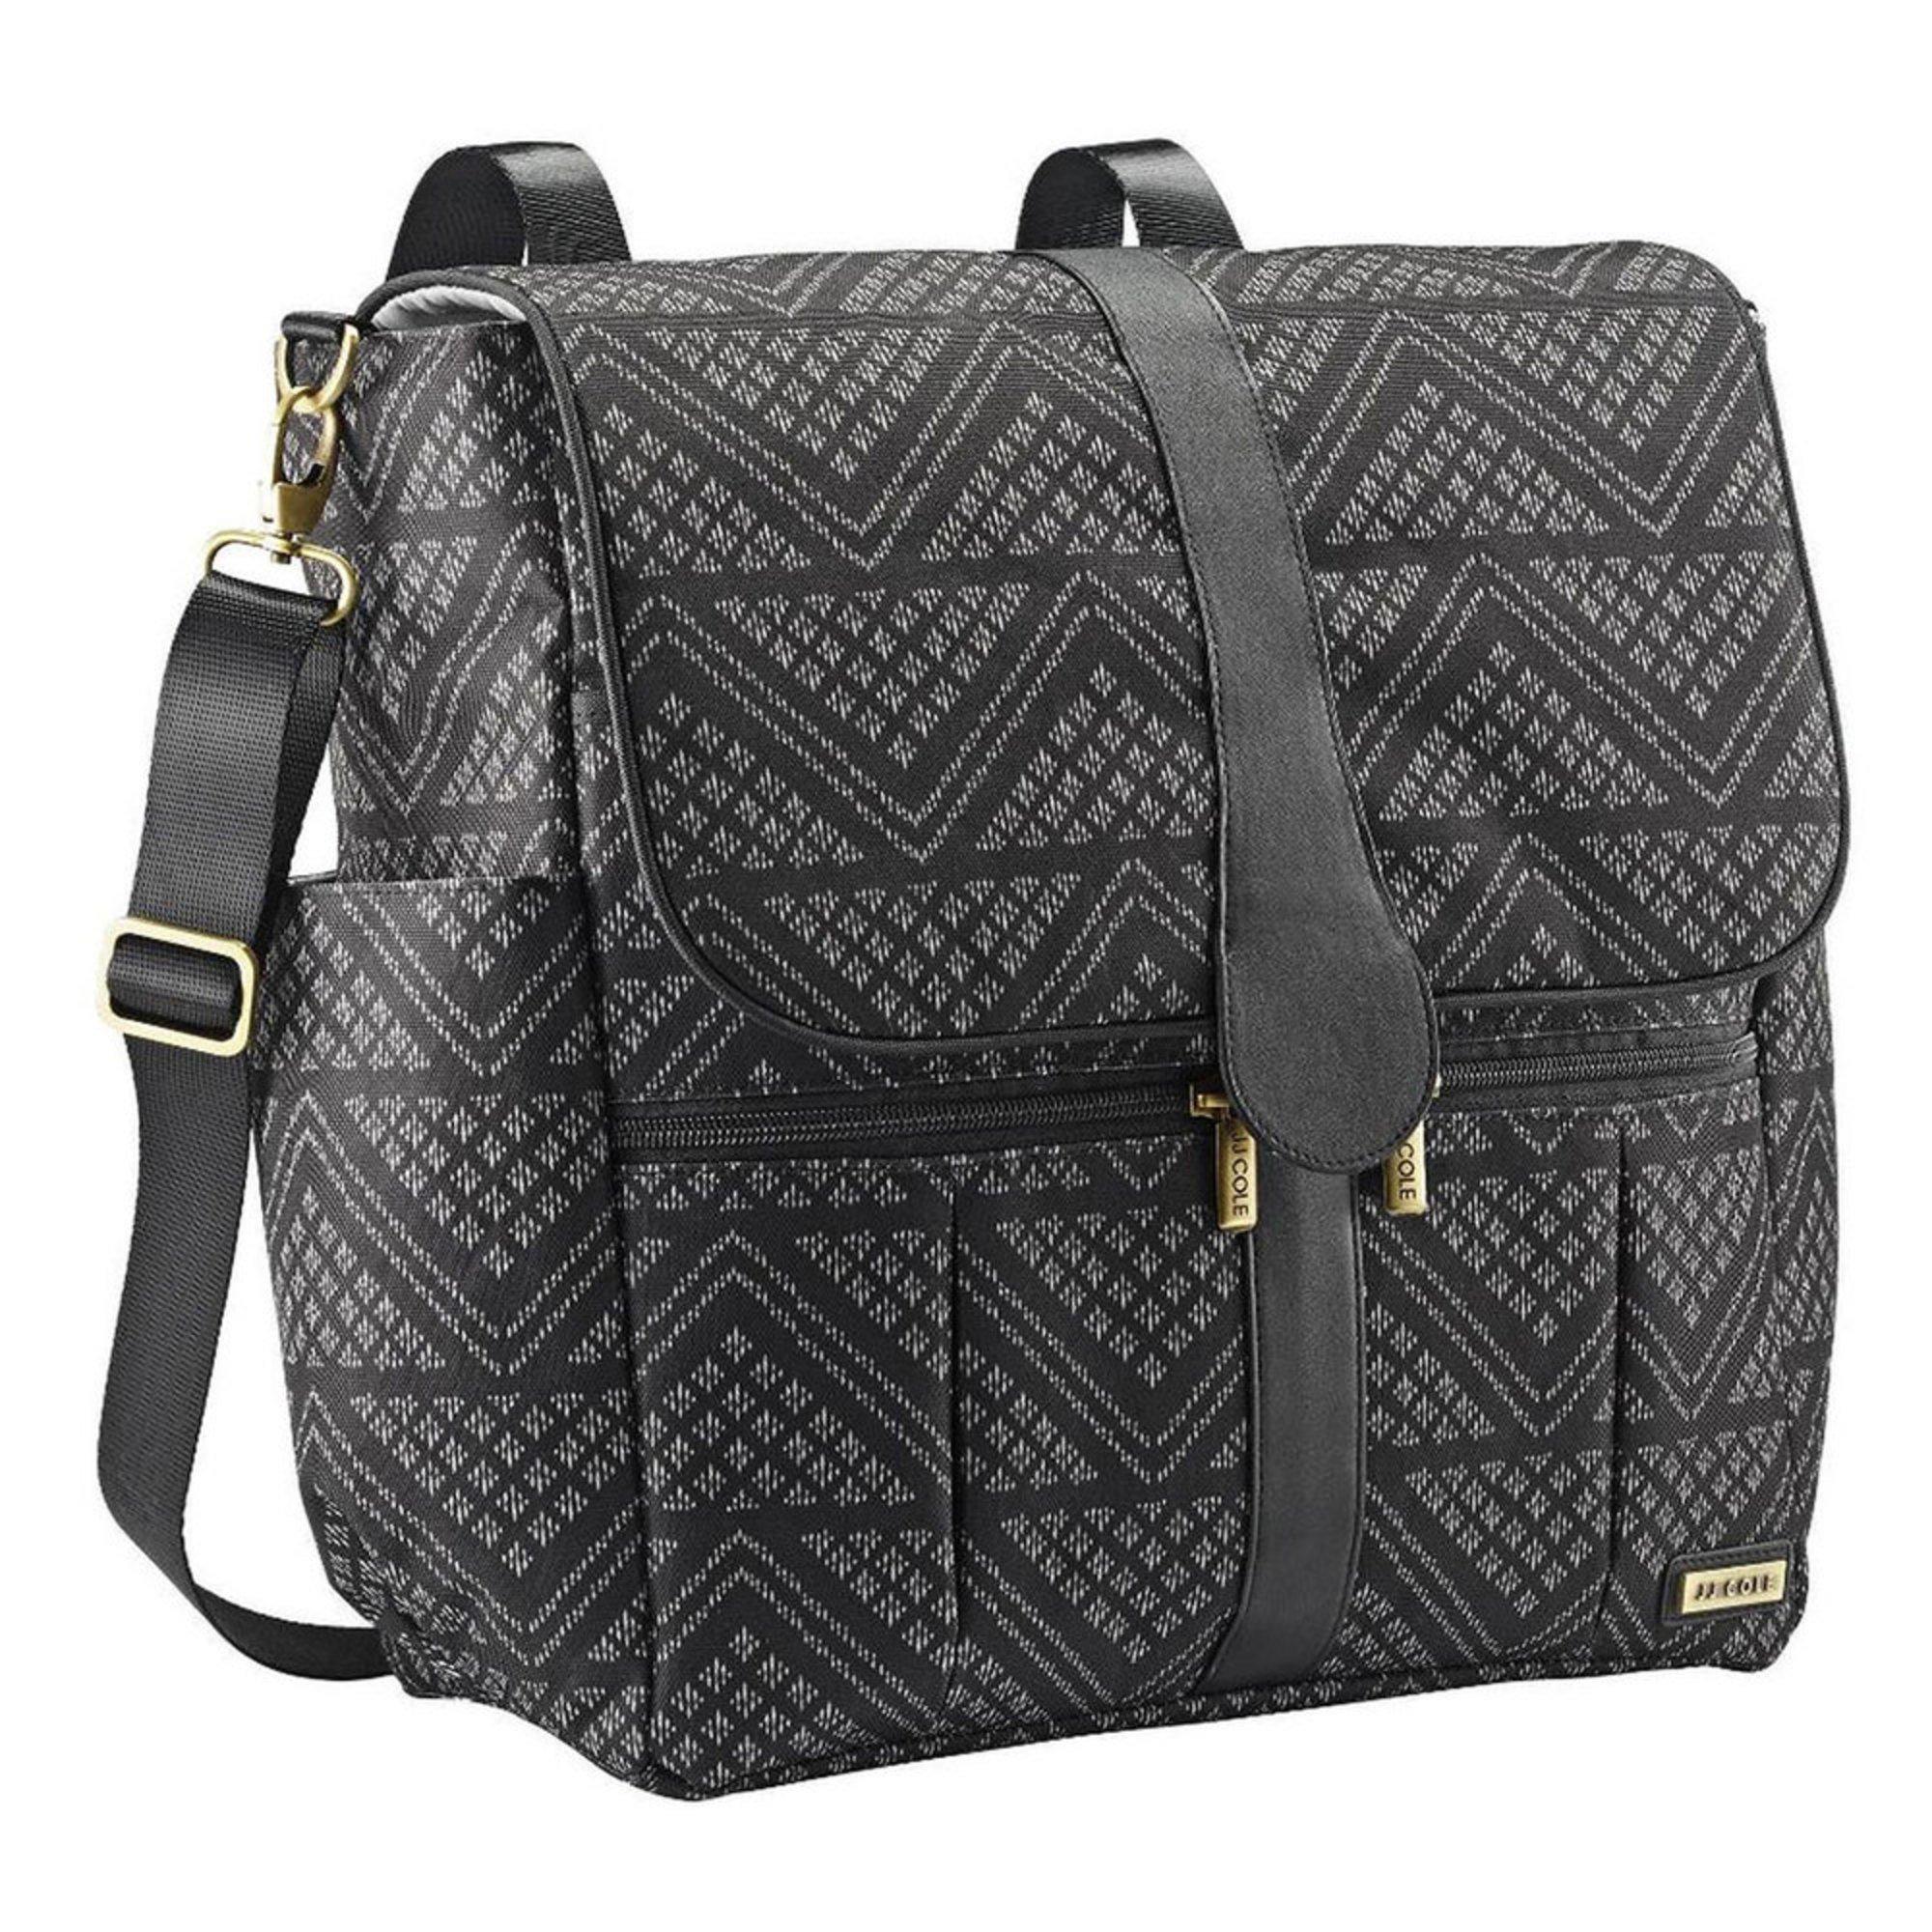 39450de2f50 JJ Cole. JJ Cole Backpack Diaper Bag ...